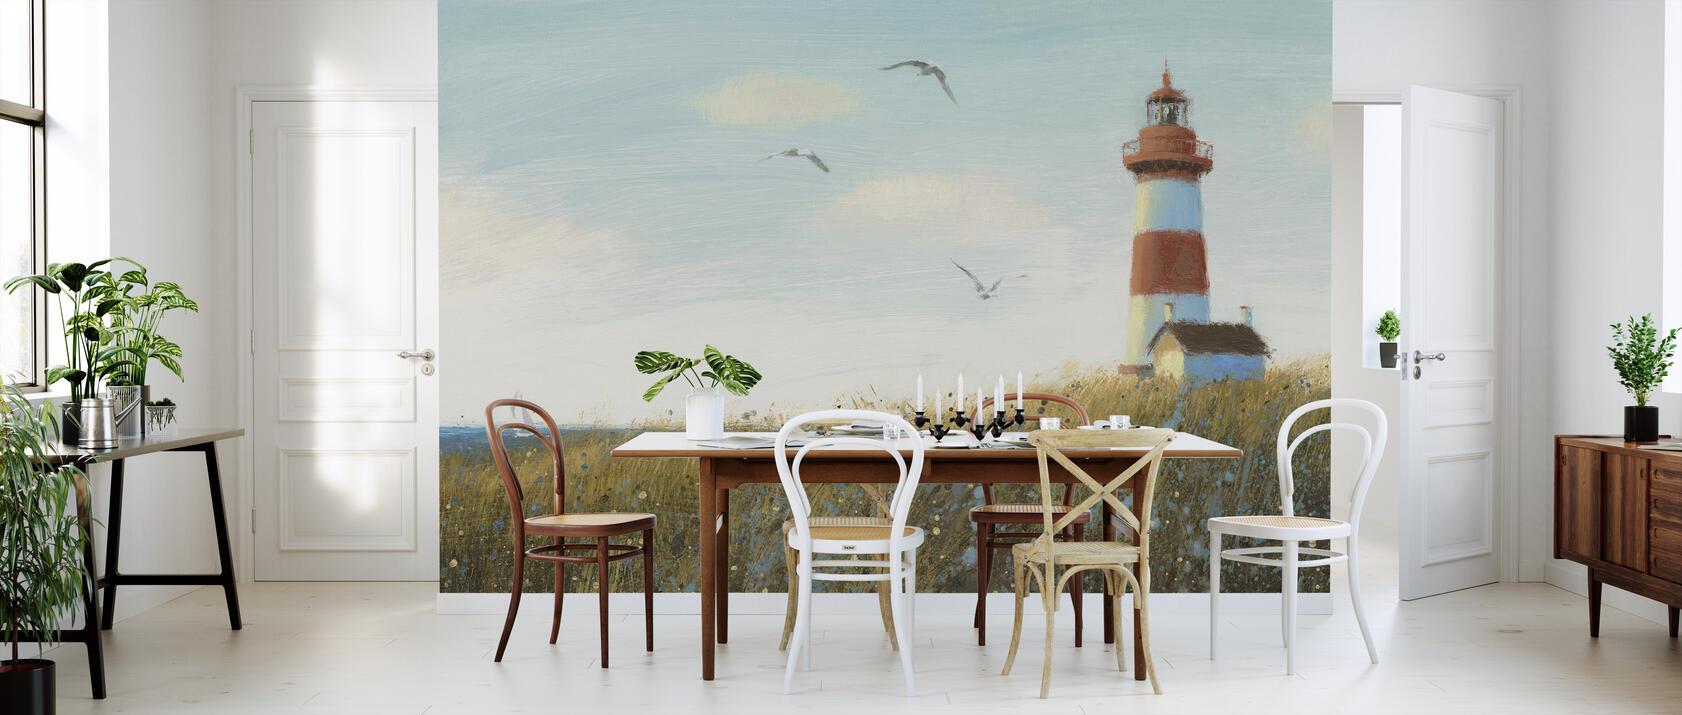 seaside view fototapete nach ma photowall. Black Bedroom Furniture Sets. Home Design Ideas